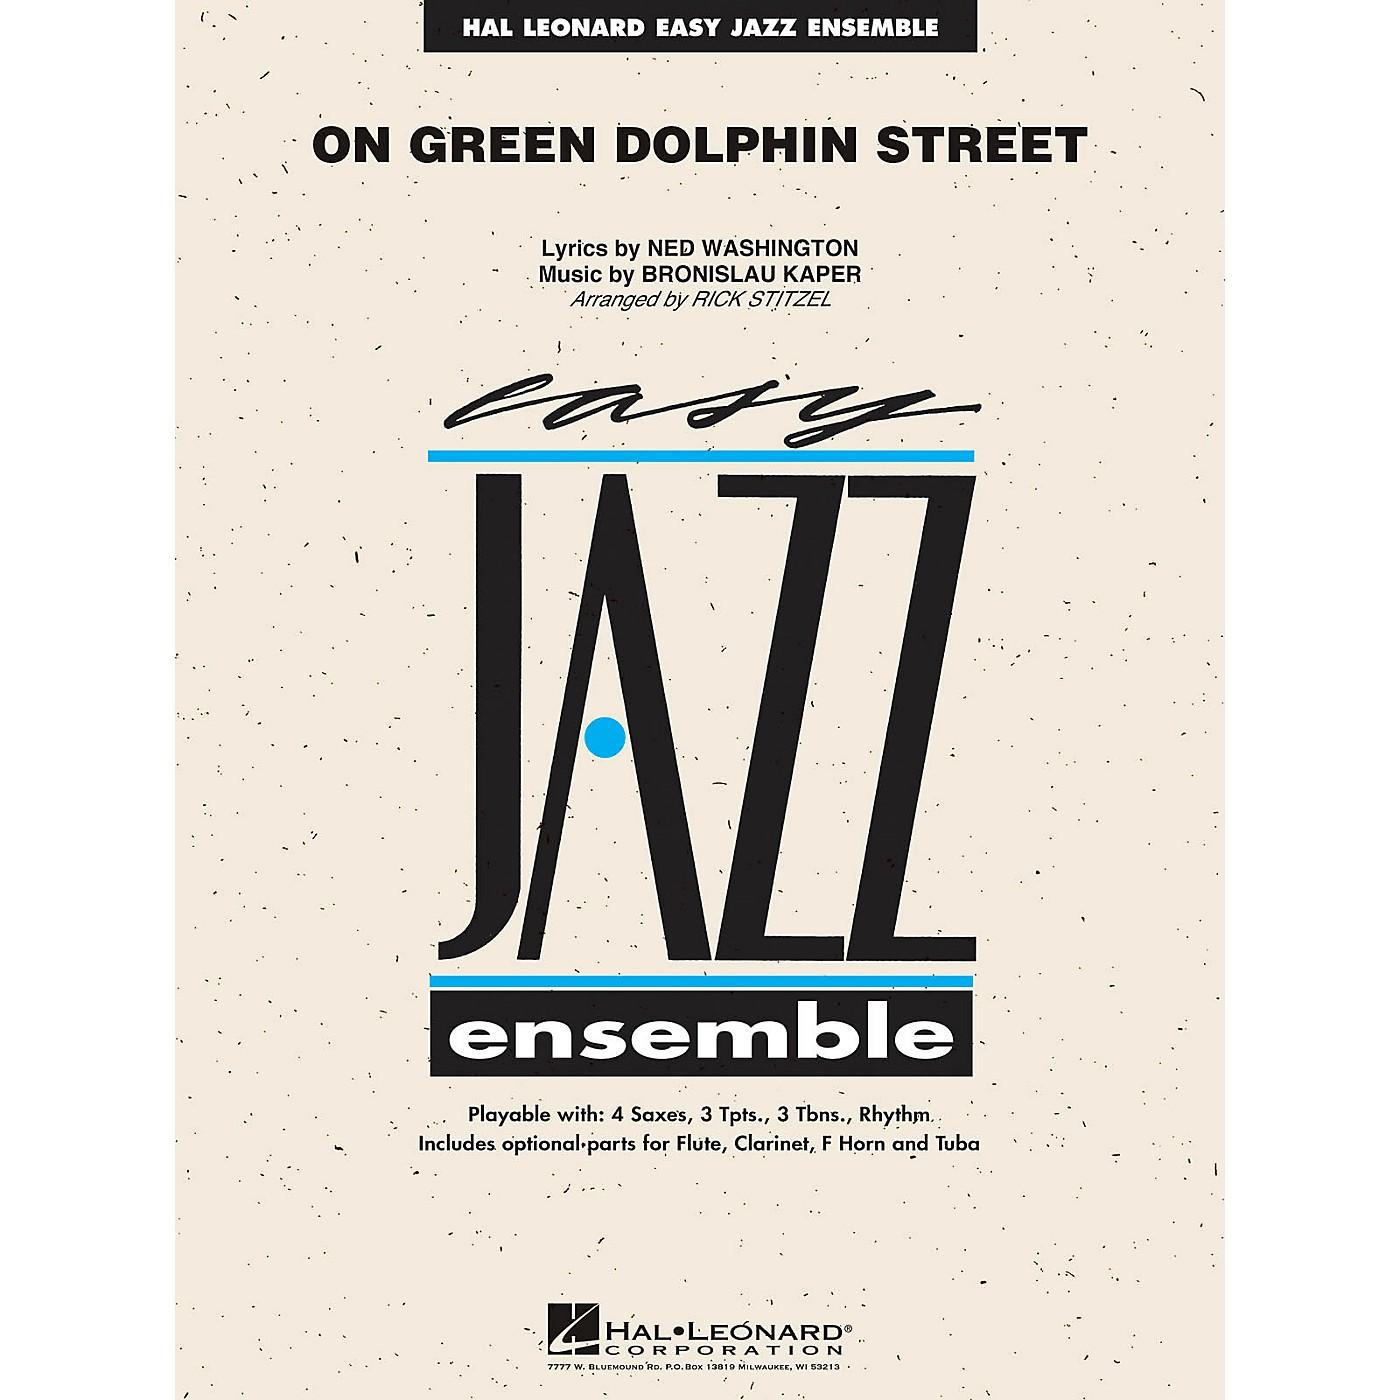 Hal Leonard On Green Dolphin Street Jazz Band Level 2 Arranged by Rick Stitzel thumbnail